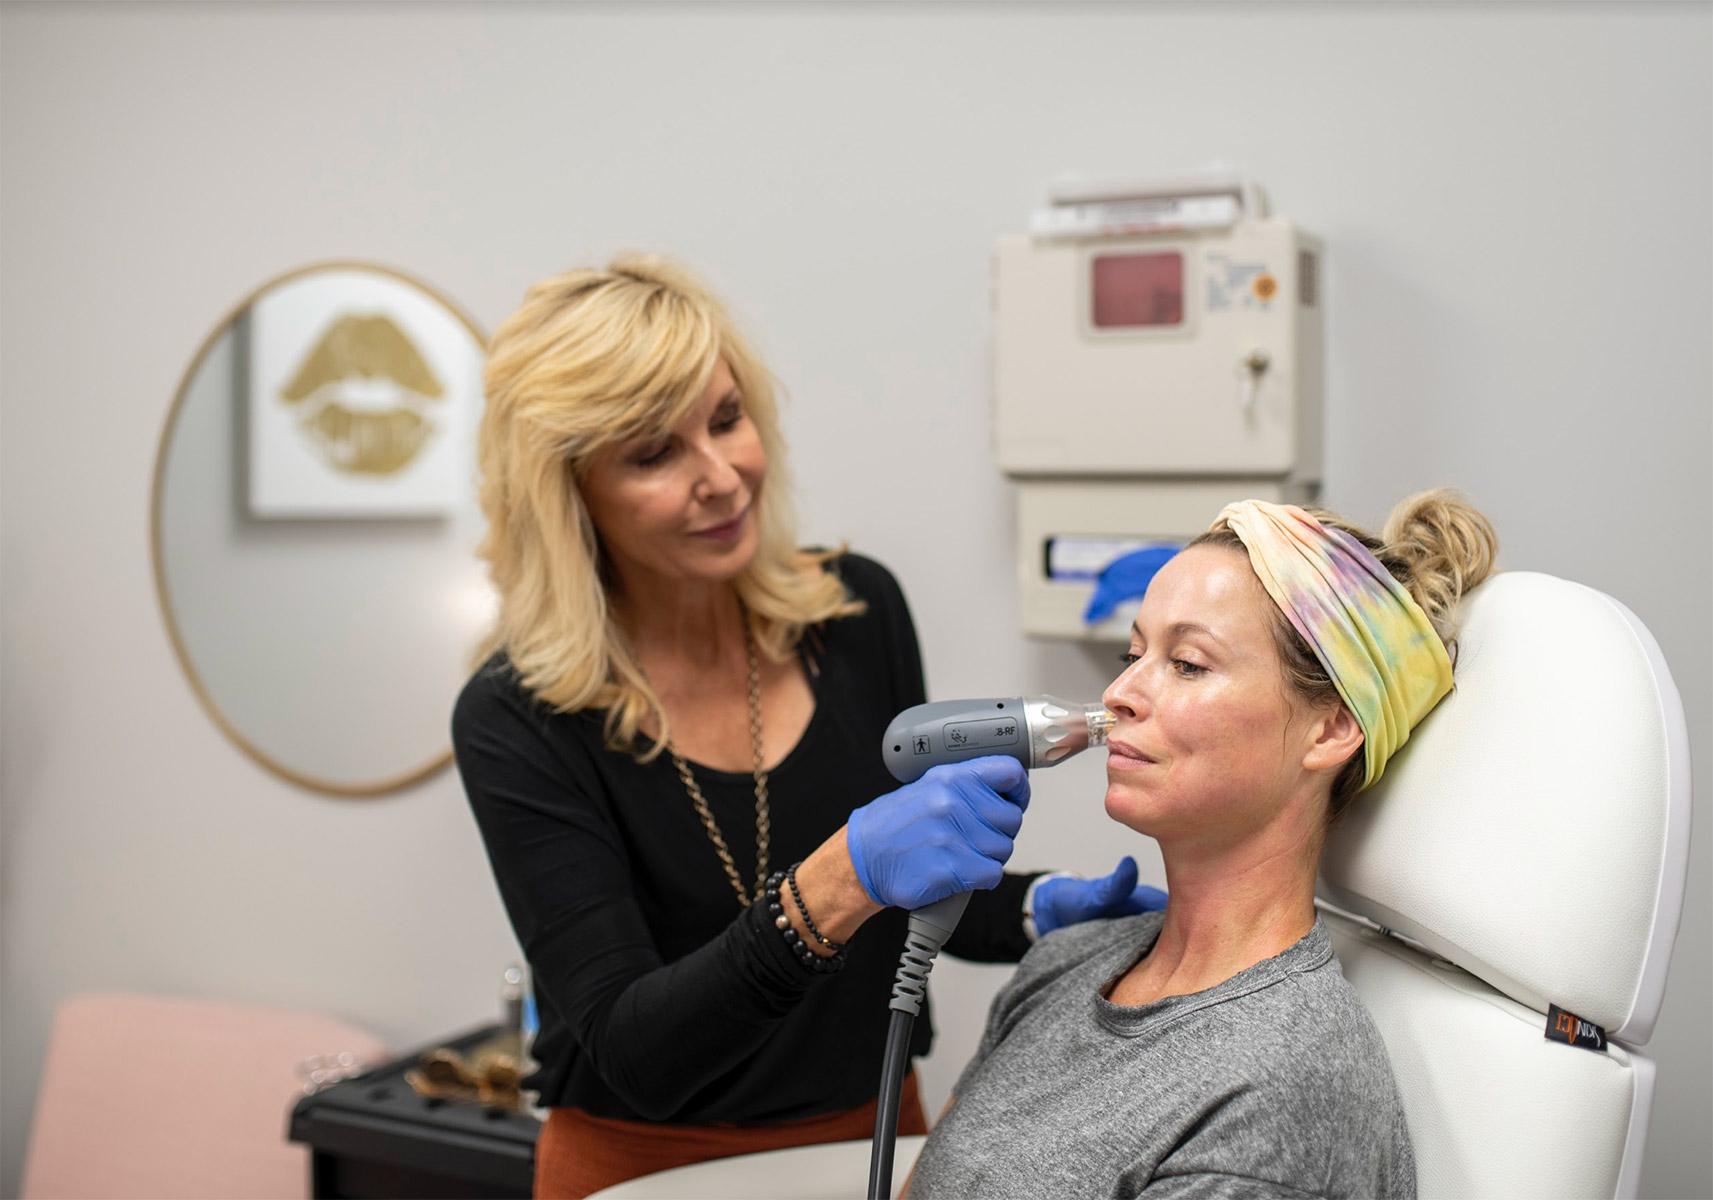 laser hair removal demonstration